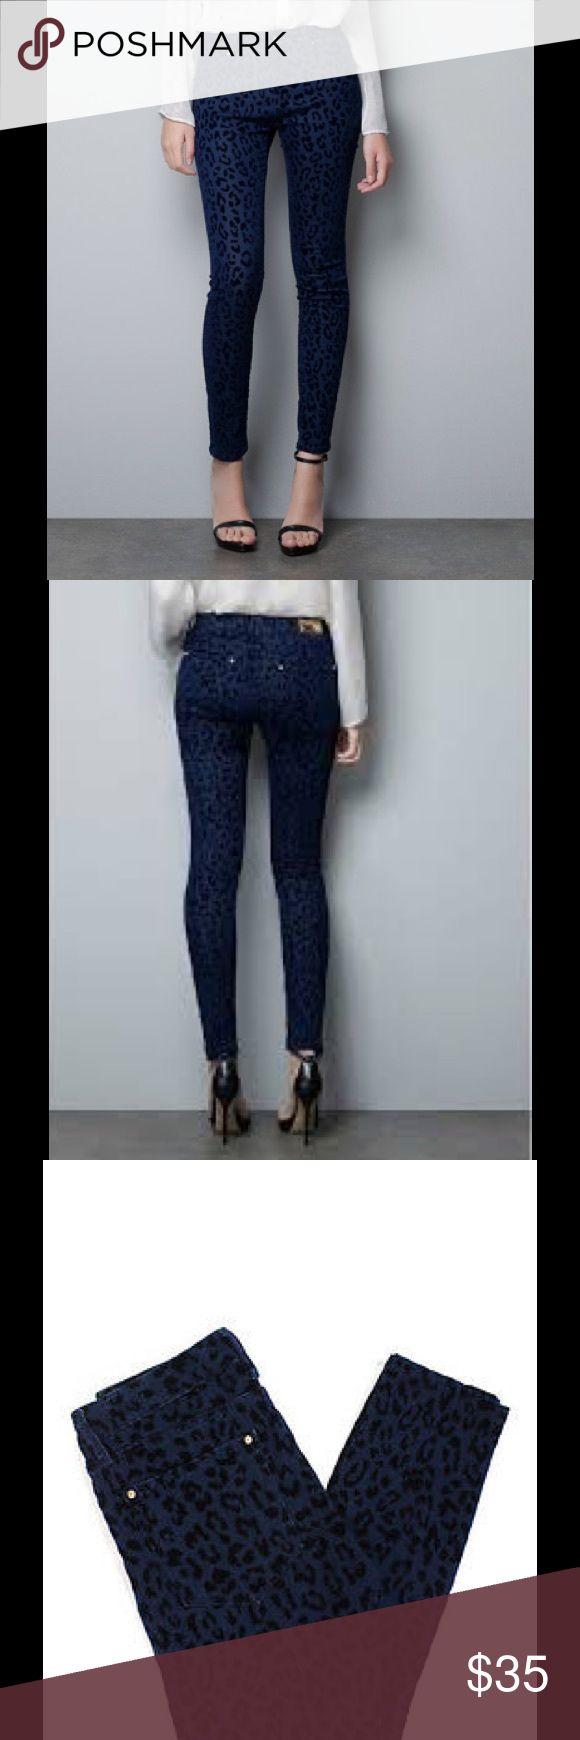 "Zara Blue Animal Print Slim Skinny Pants Very Good Condition Waist: 28"" Hips: 31"" Inseam: 29  Velvet Textured  3 Front, 2 Back  Zipper Fly Closure Material: Cotton Blend Zara Pants Skinny"